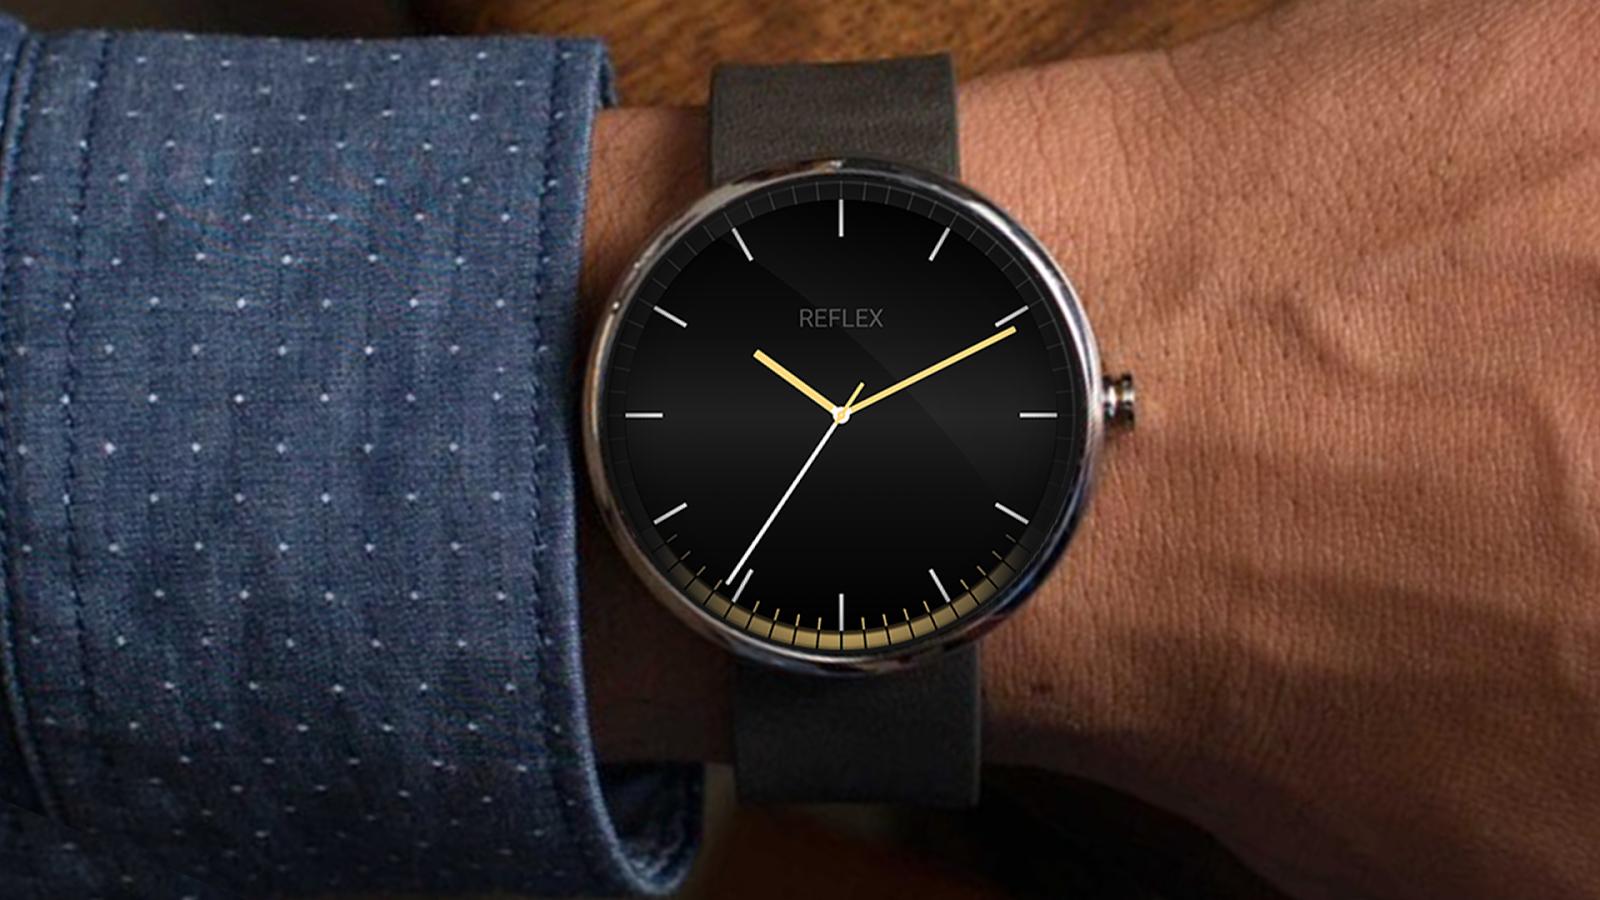 Designer android wear watchface - Reflex Watch Face Android Wear Screenshot